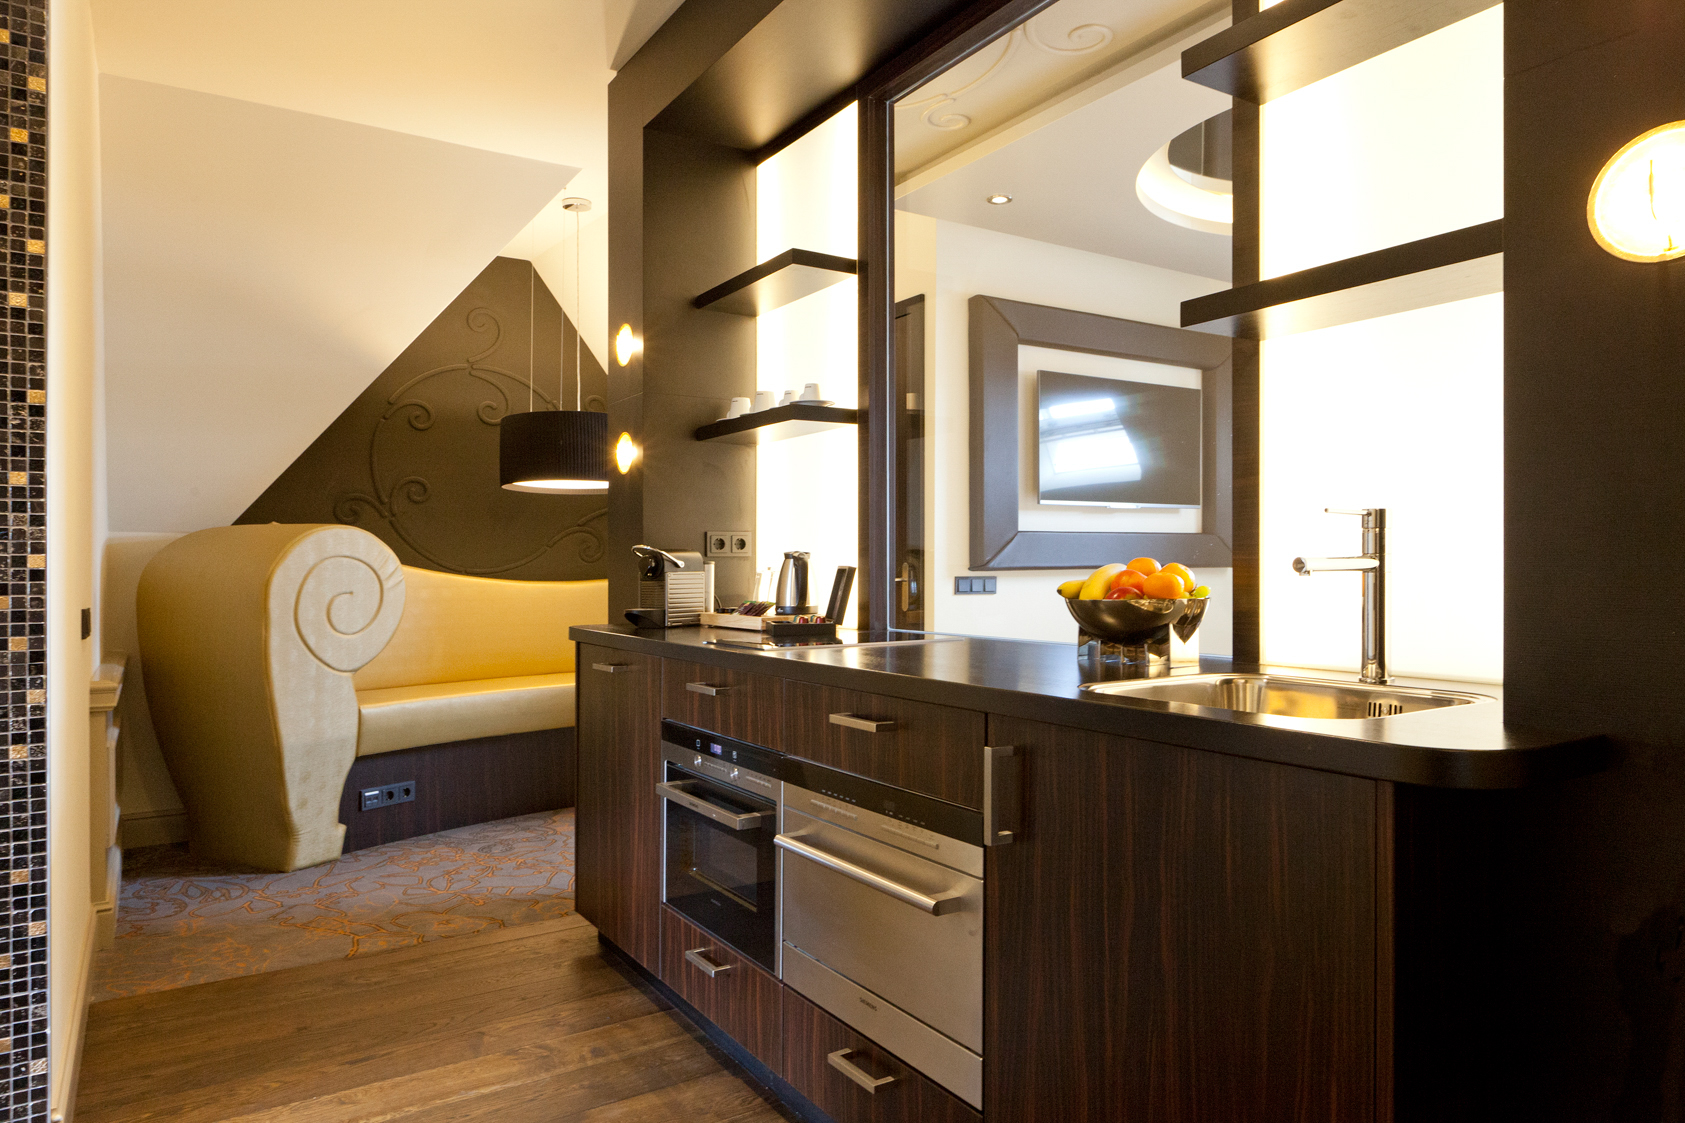 Hotel Restaurant 't Goude Hooft Den Haag-44.jpg